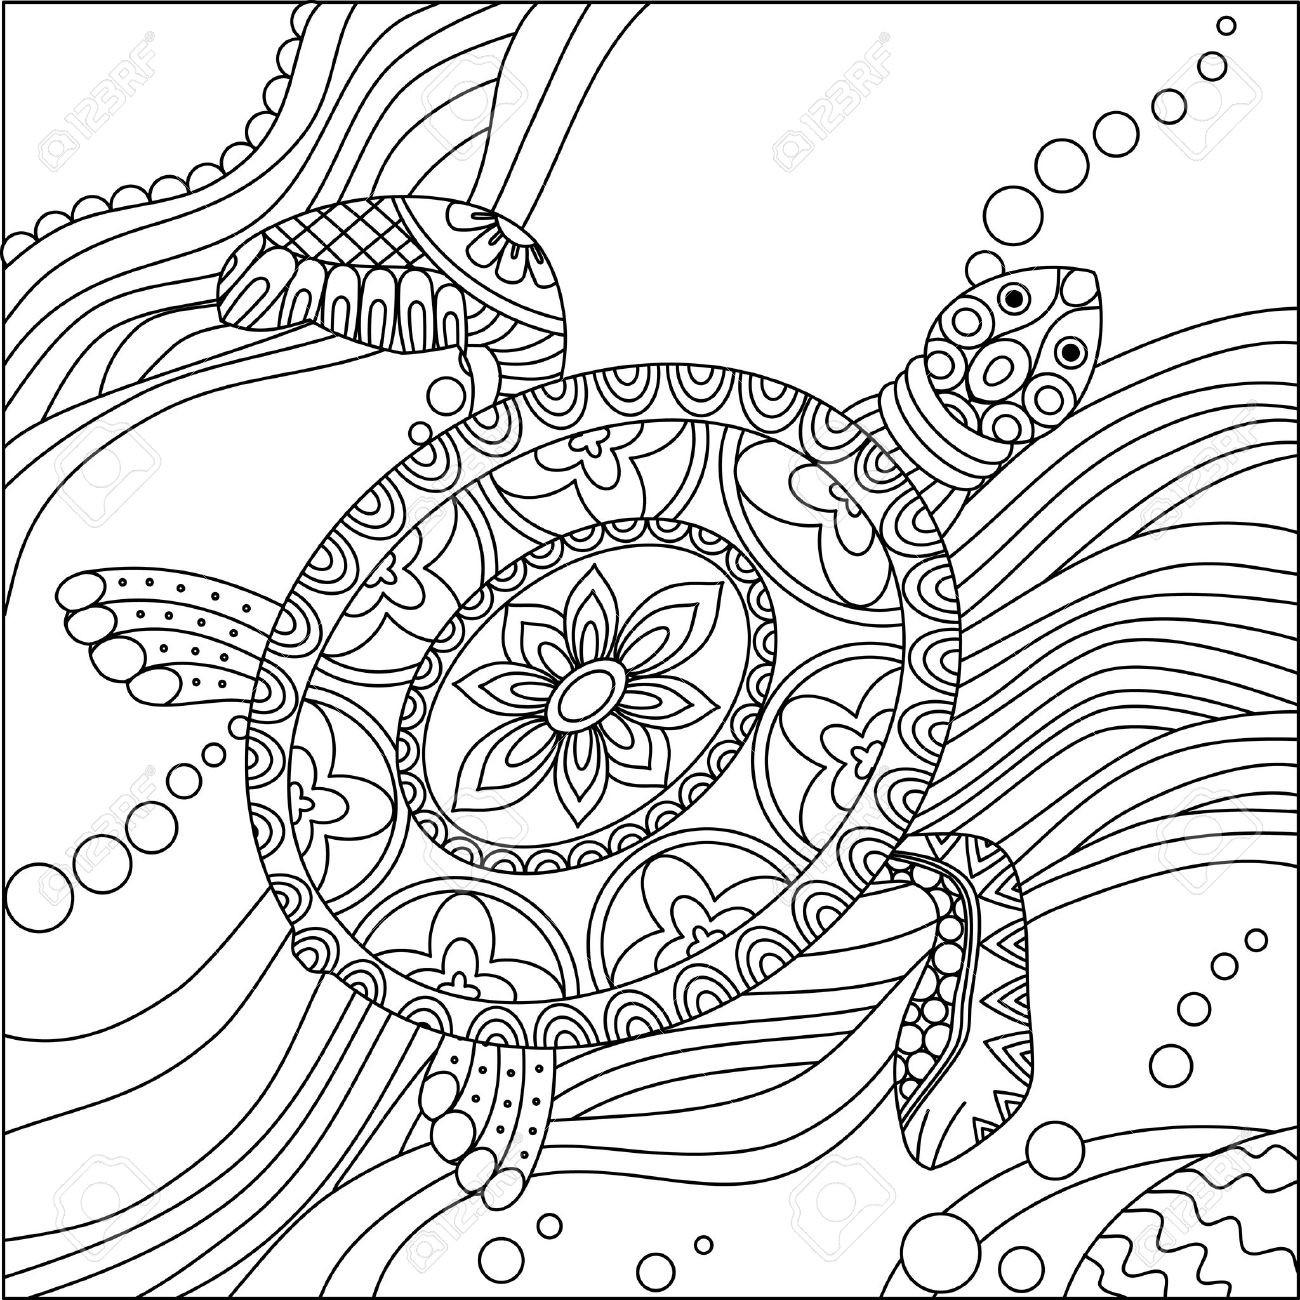 1300x1300 Sea Turtle Coloring Page Elegant Sea Turtle Doodle Hand Drawn